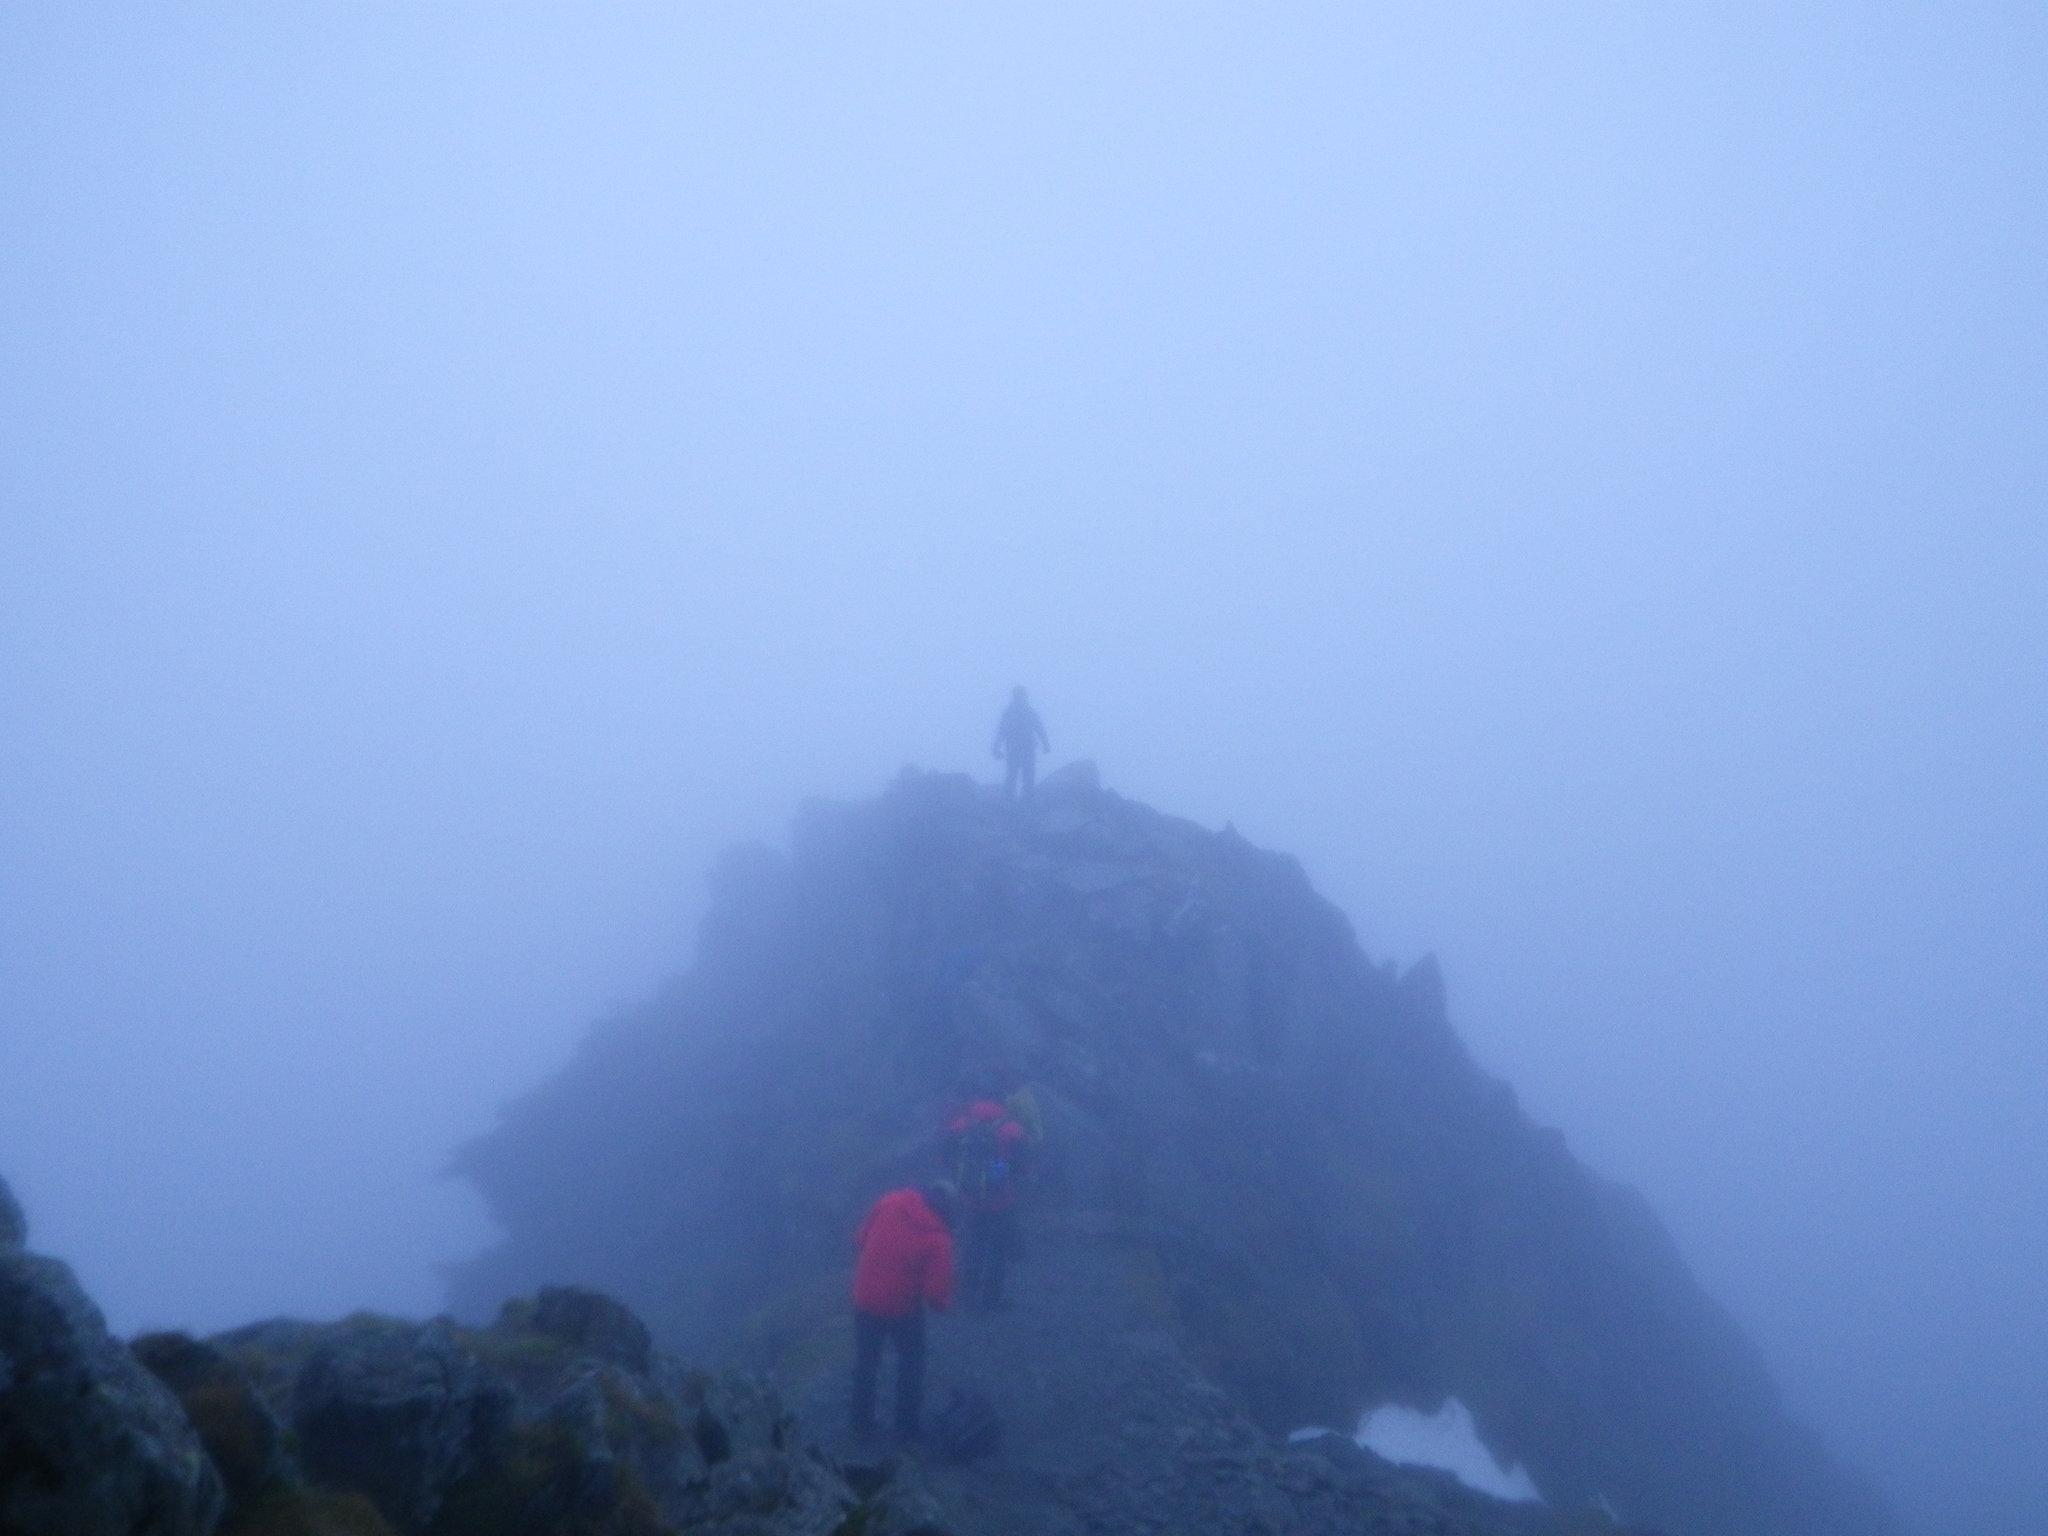 MLA 17.01 Mountain Leader training 07 resized.jpg